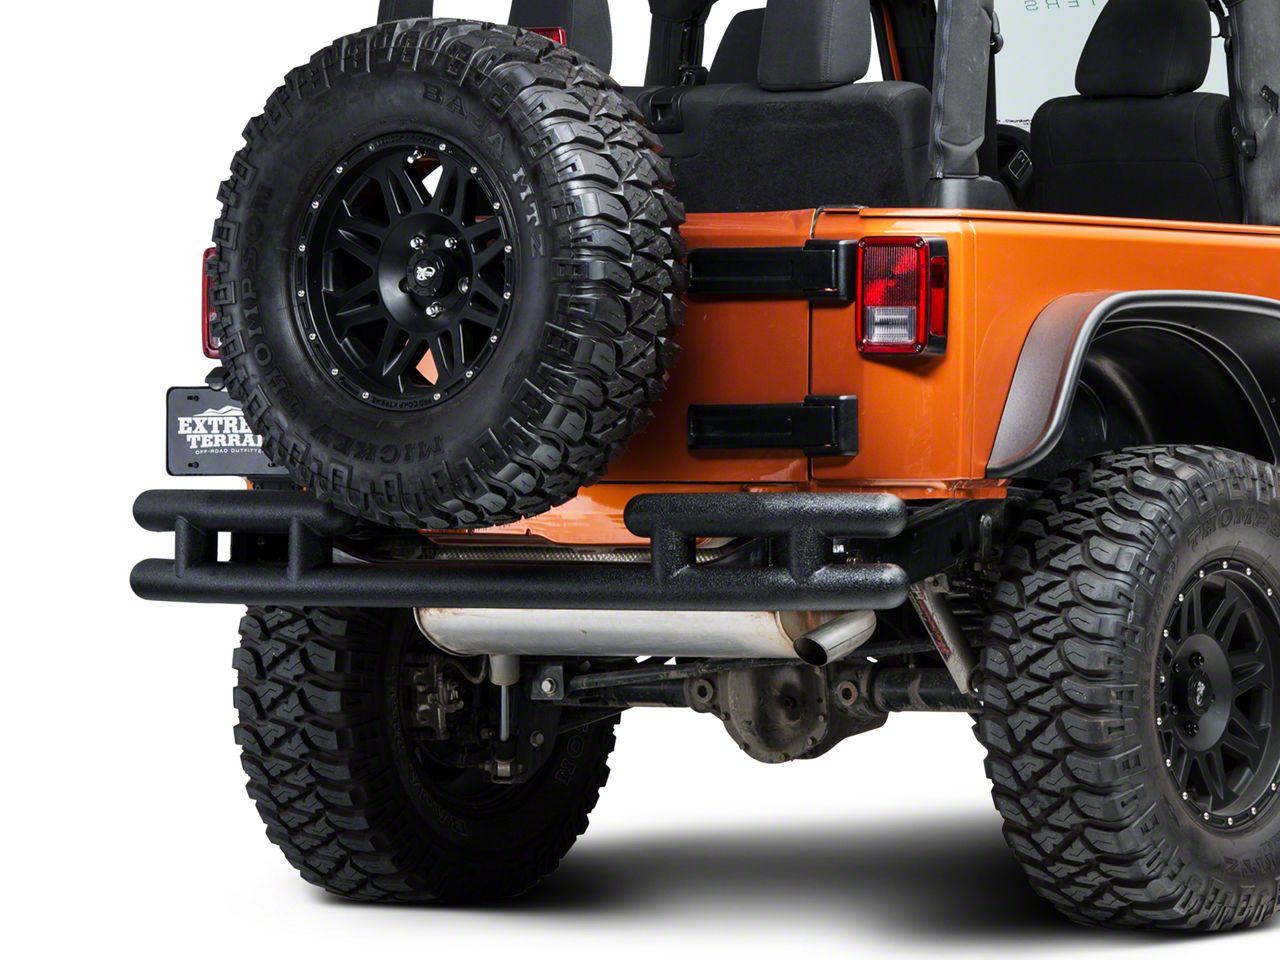 Barricade Rear Tubular Bumper - Textured Black (07-18 Jeep Wrangler JK)